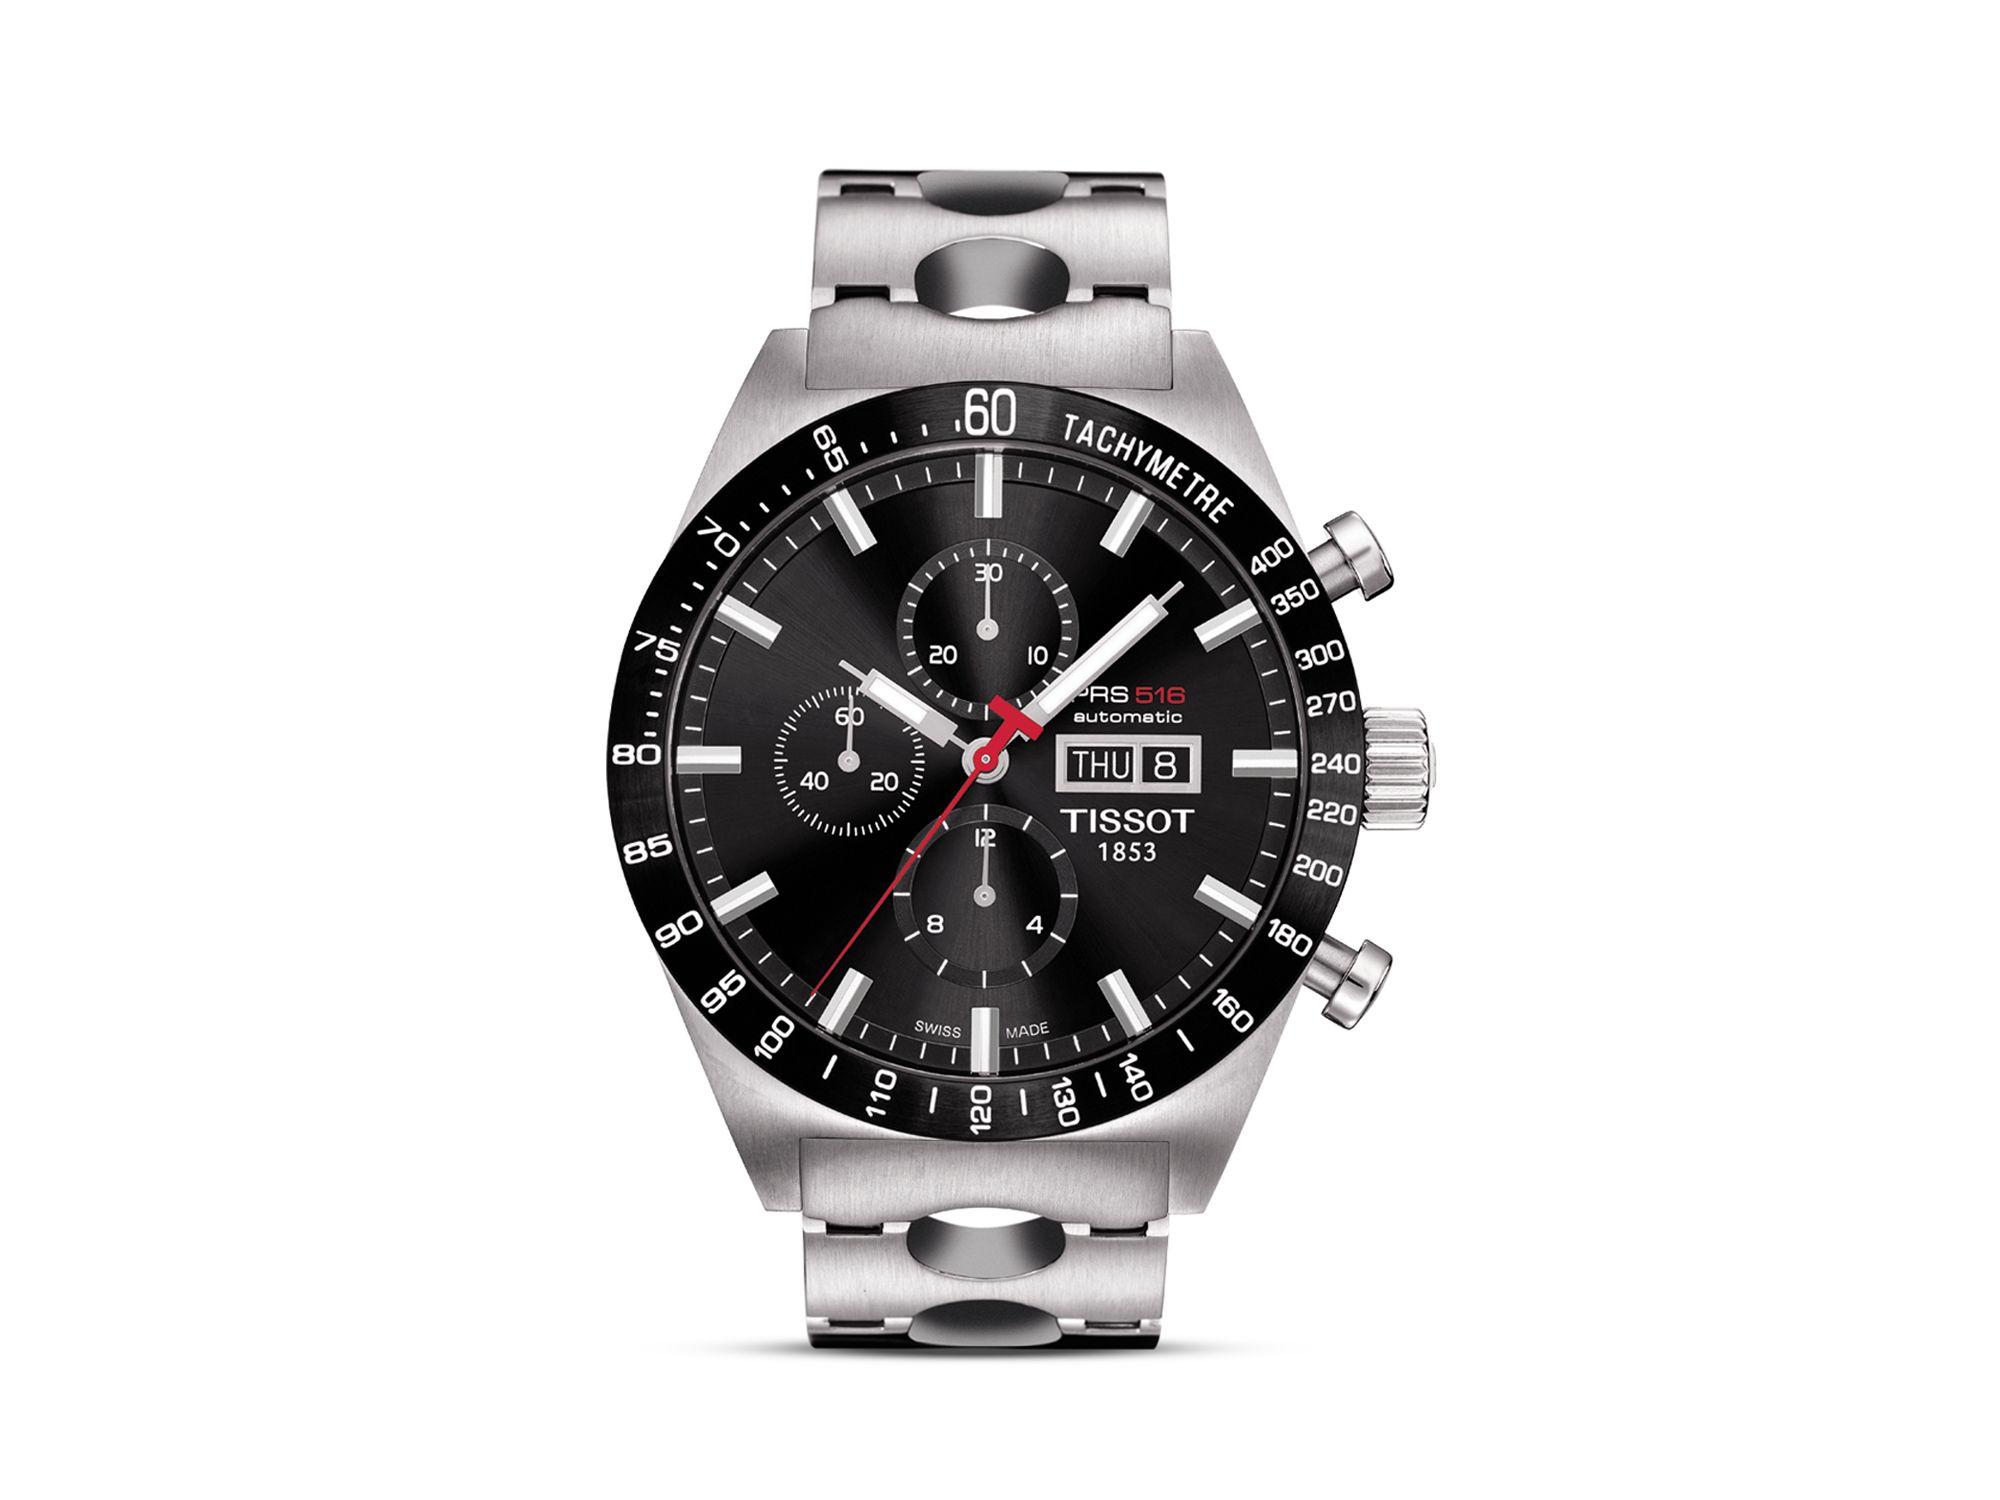 3a32dd2672ea Lyst - Tissot Prs516 Men s Black Automatic Chronograph Steel Watch ...